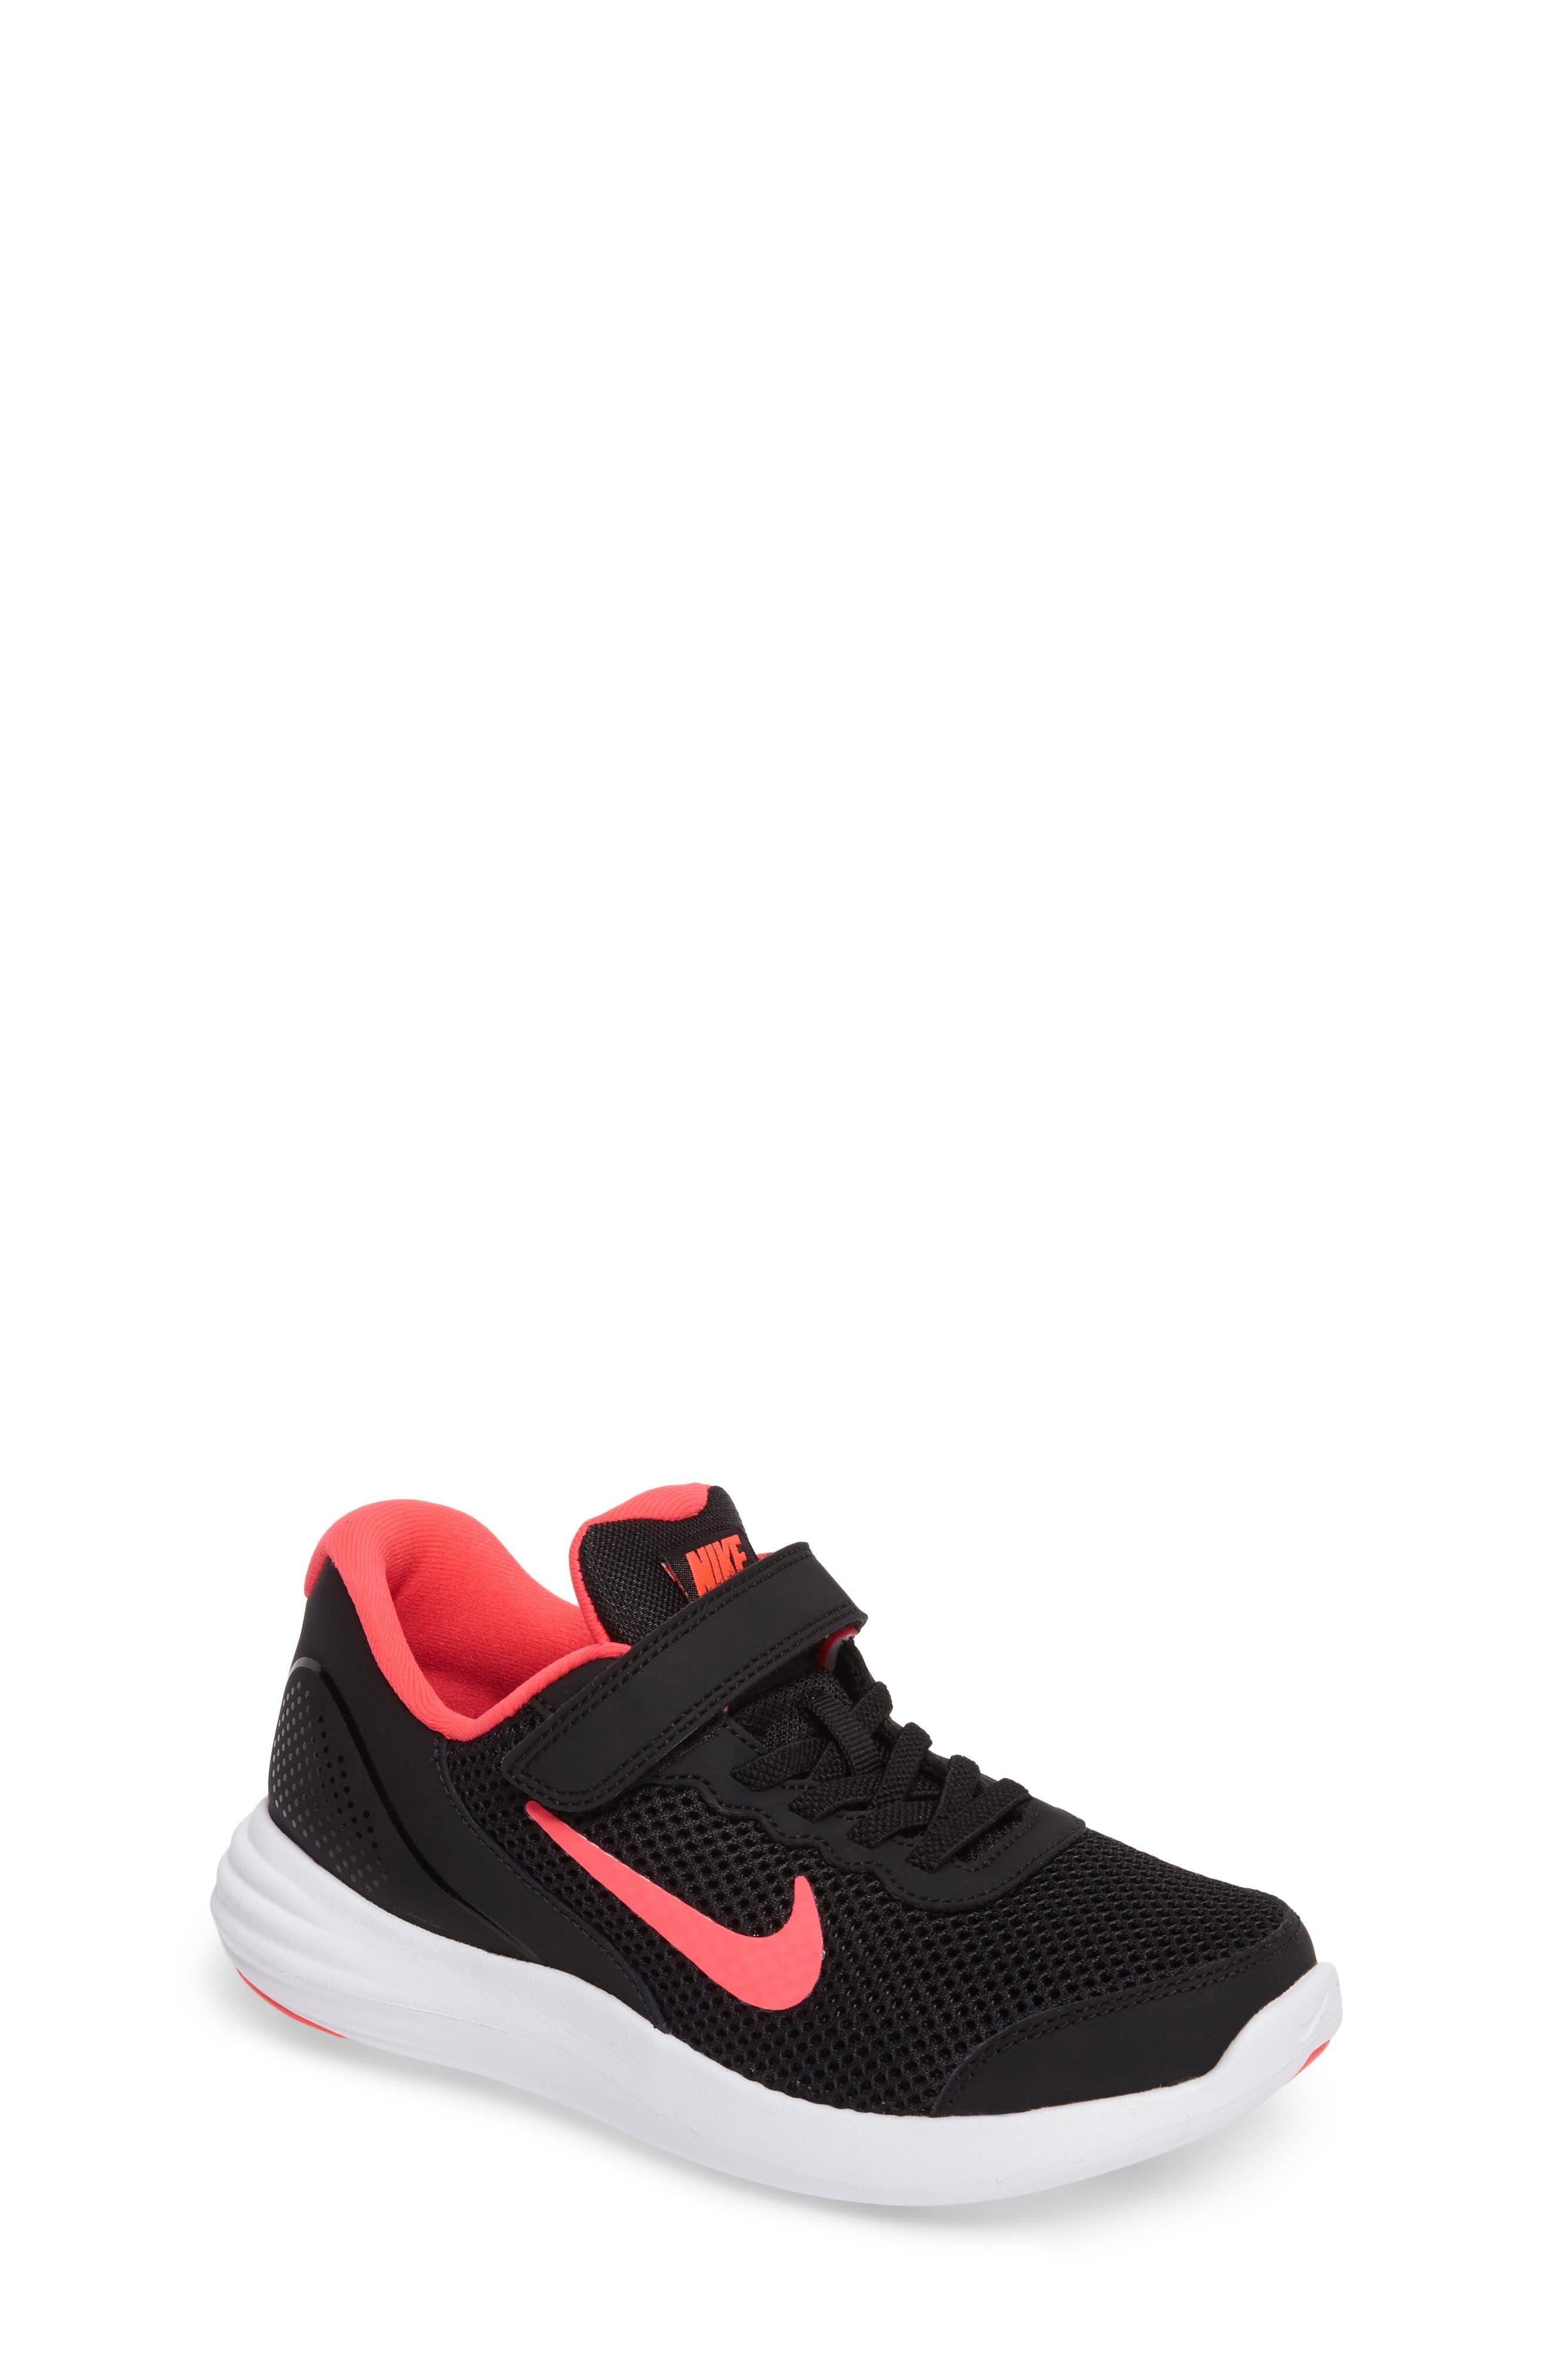 Lunar Apparent Sneaker,                             Main thumbnail 1, color,                             Black/ Racer Pink/ White